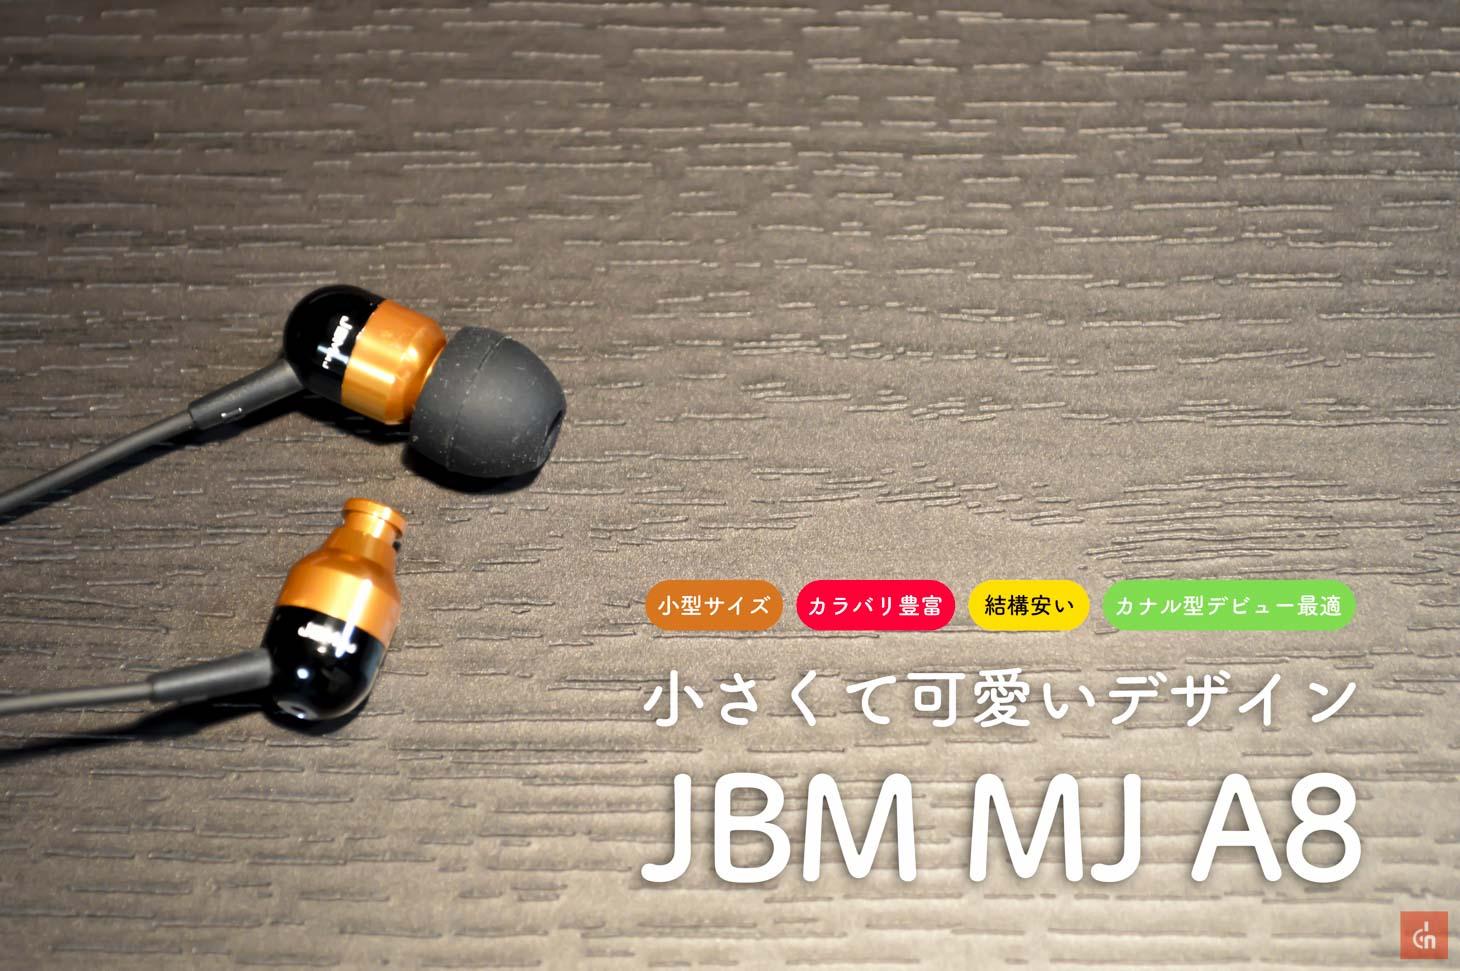 020_20160223_jbm-mj-a8